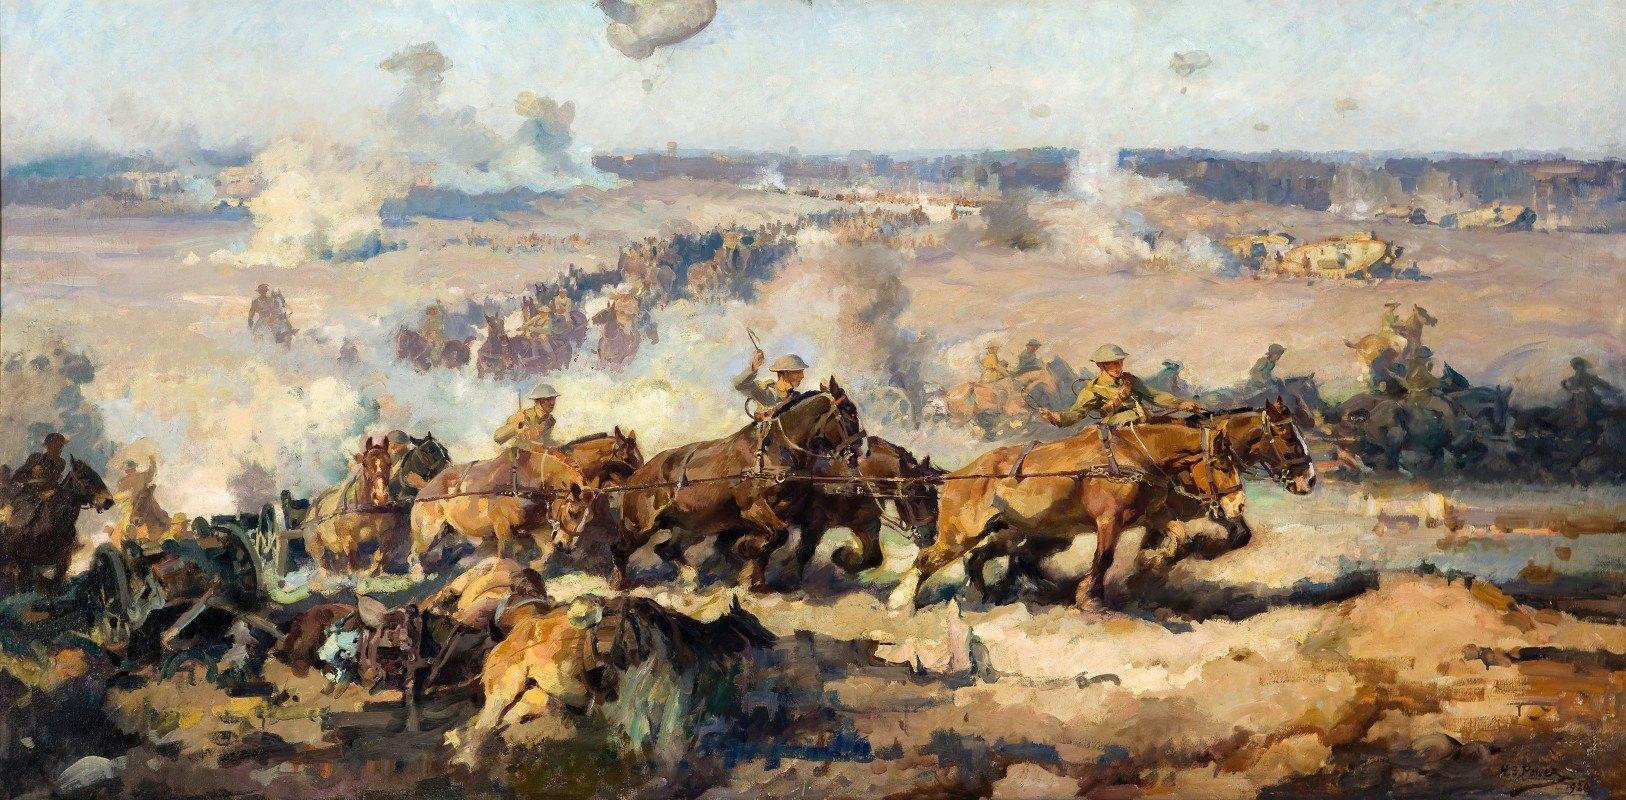 Septimus Power - The Battle Before Villers-Bretonneux, August 8th, 1918